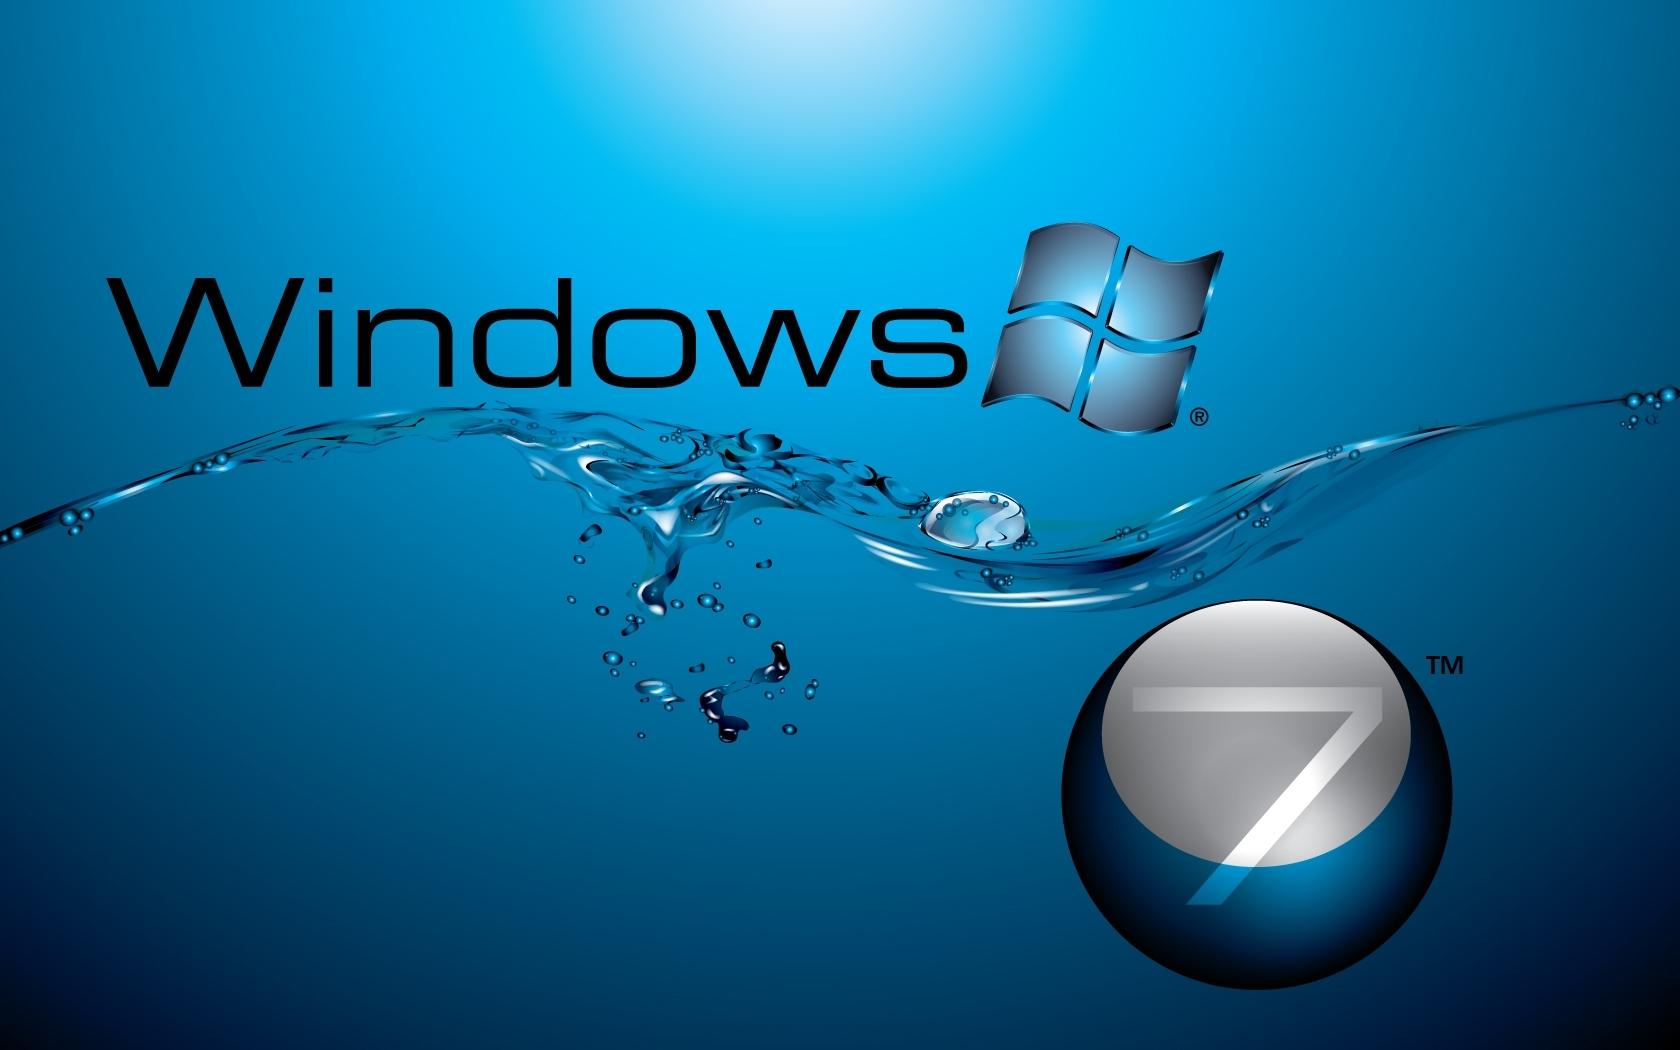 windows 7 in water flow wallpapers | hd wallpapers | id #7172